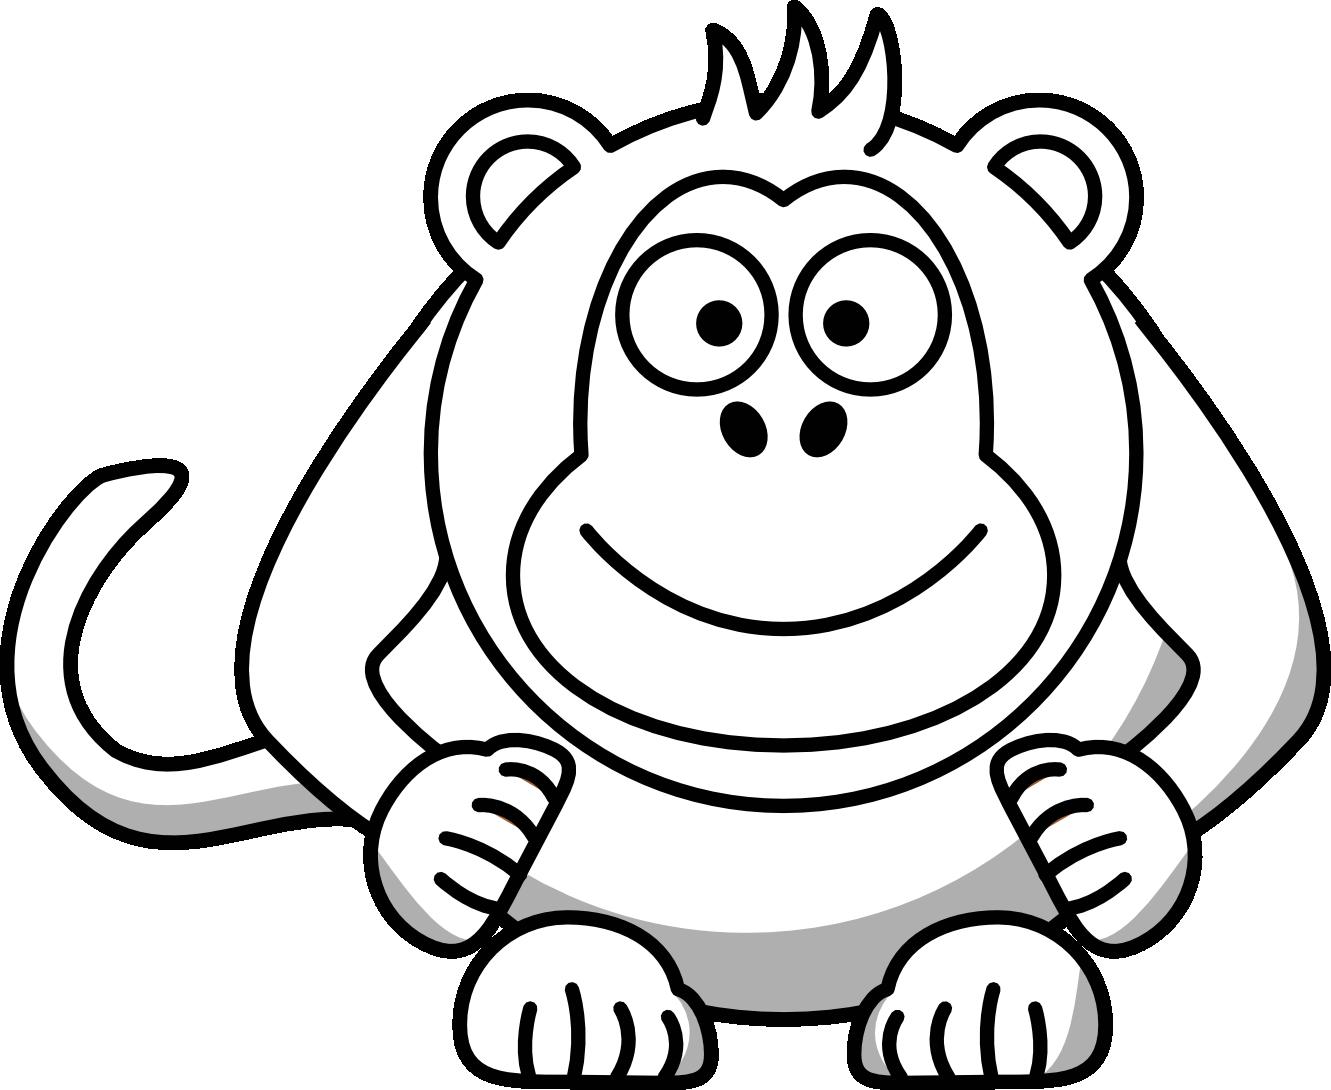 Gorilla Clipart Black And White Free download best Gorilla Clipart